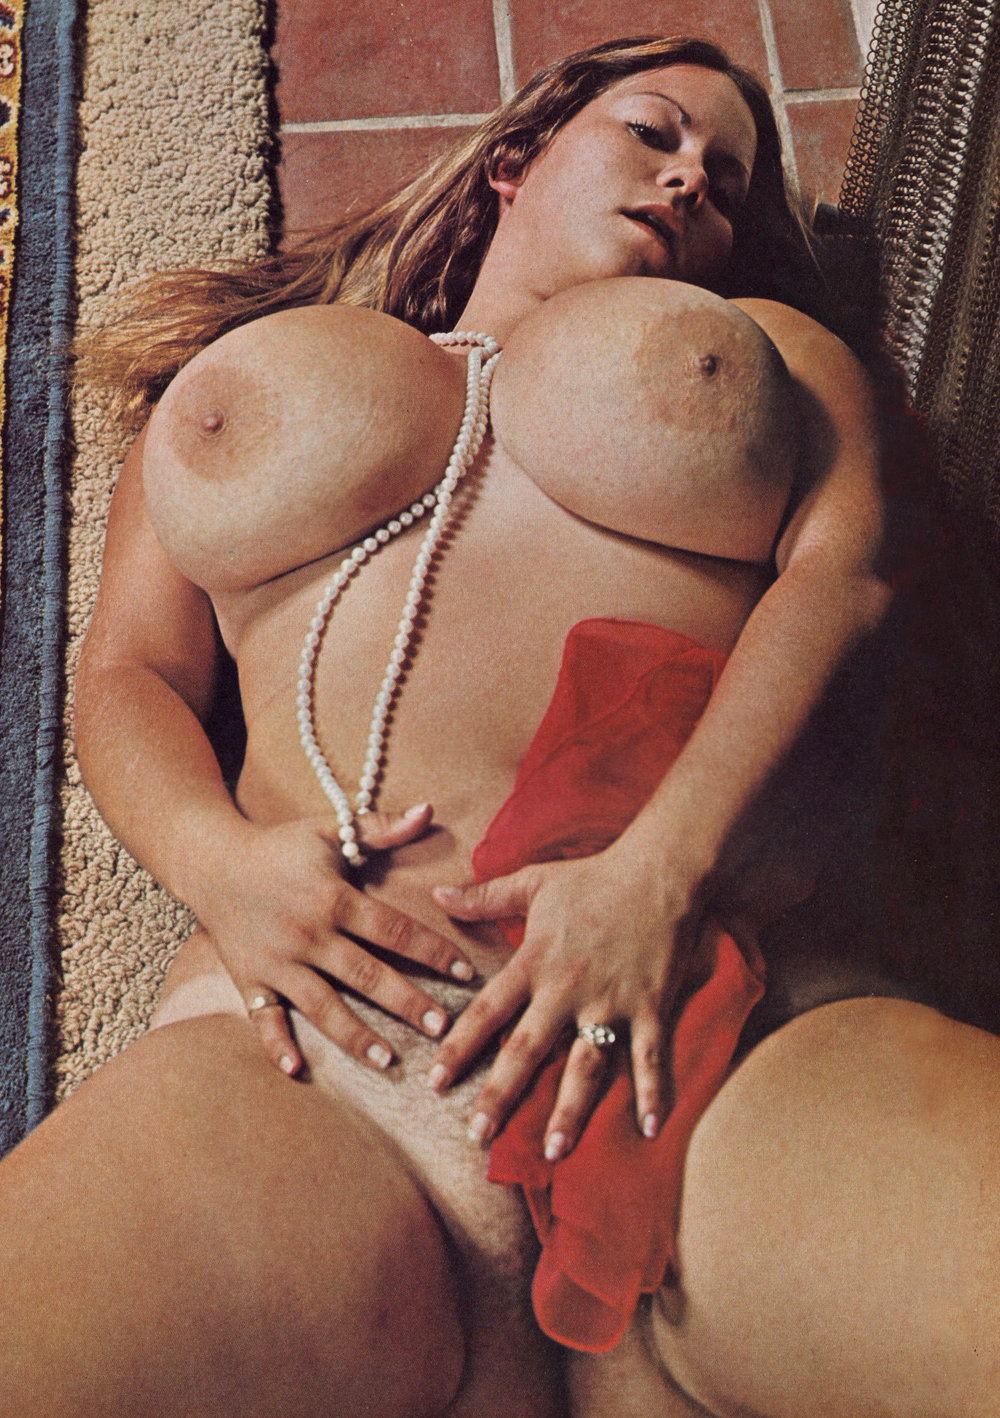 BBW model Karen Brown 11.jpg